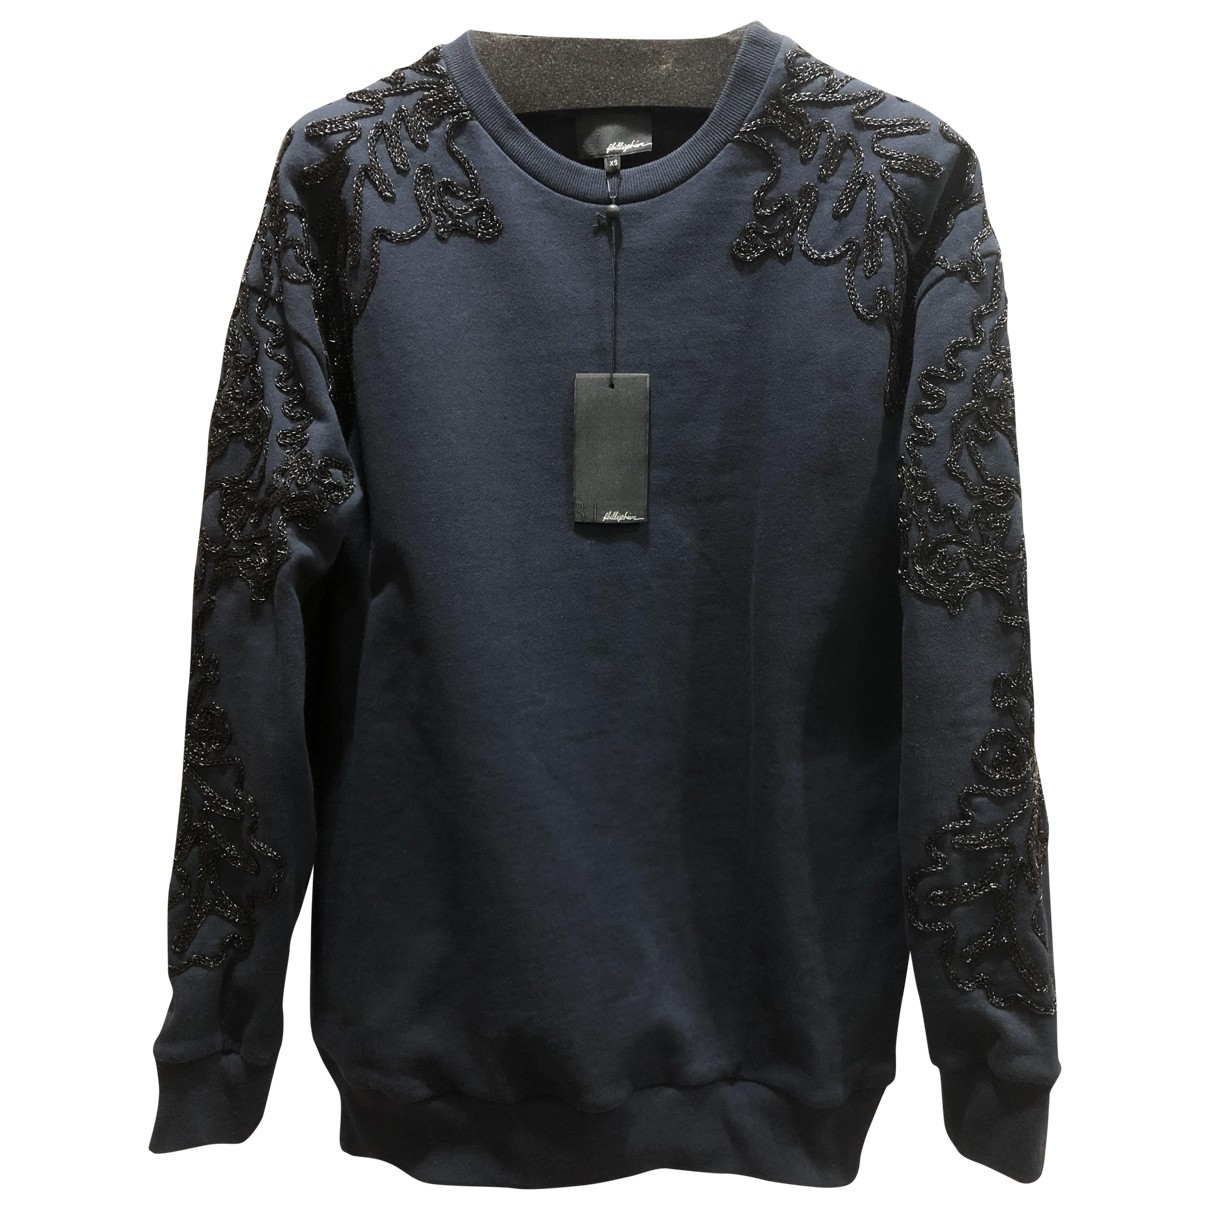 3.1 Phillip Lim \N Navy Cotton Knitwear & Sweatshirts for Men XS International